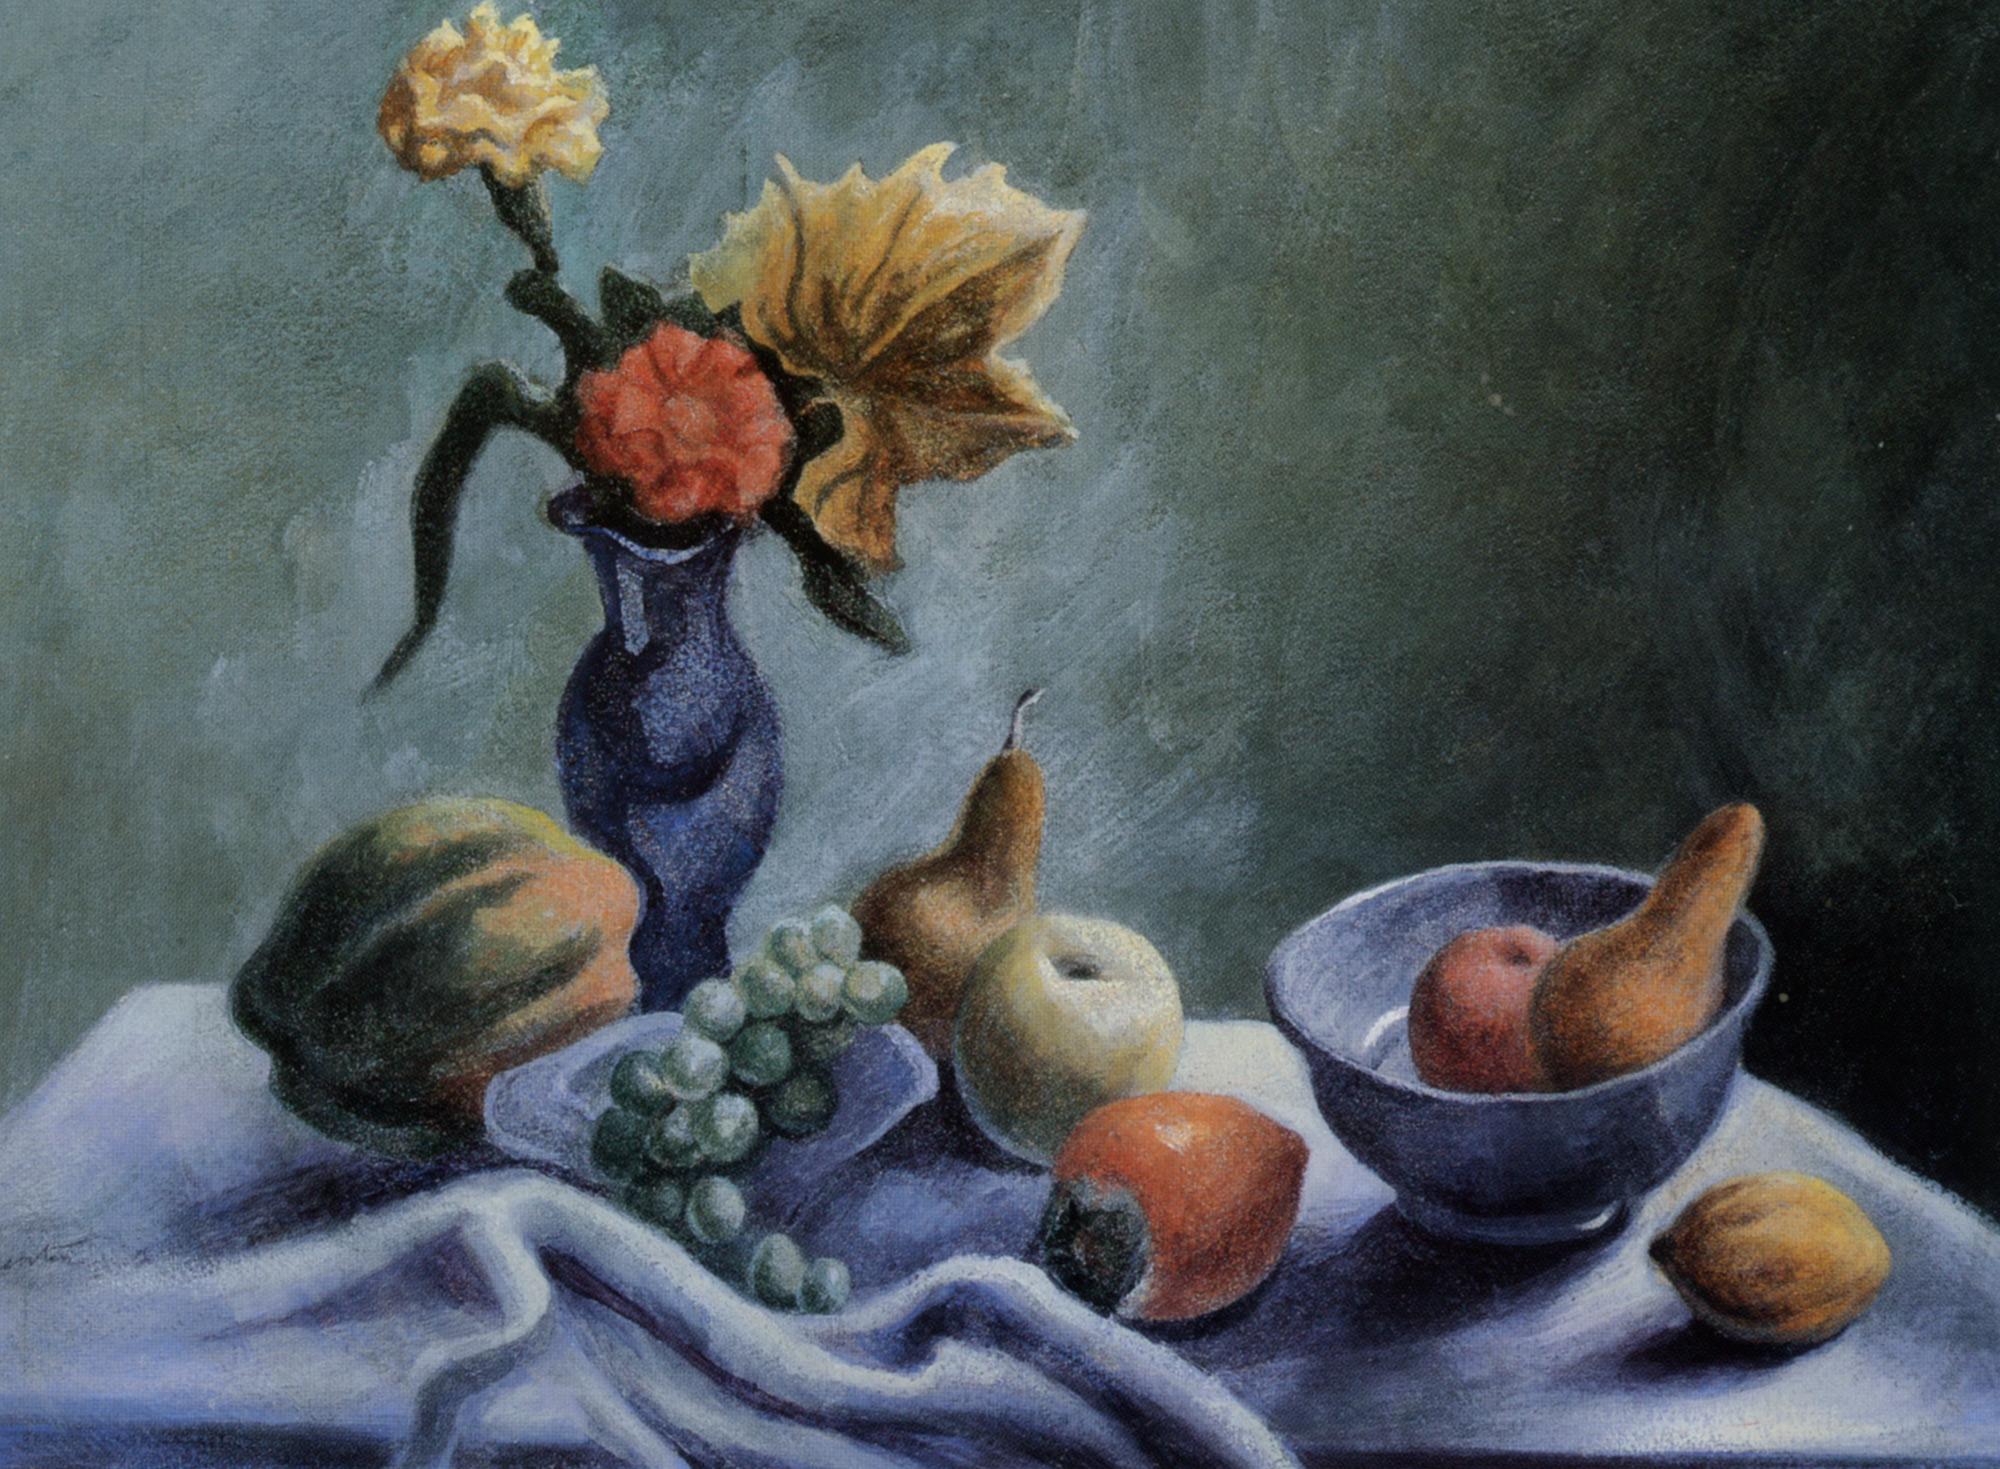 Still life with wildflowers :: Thomas Hart Benton - Still Lifes ôîòî